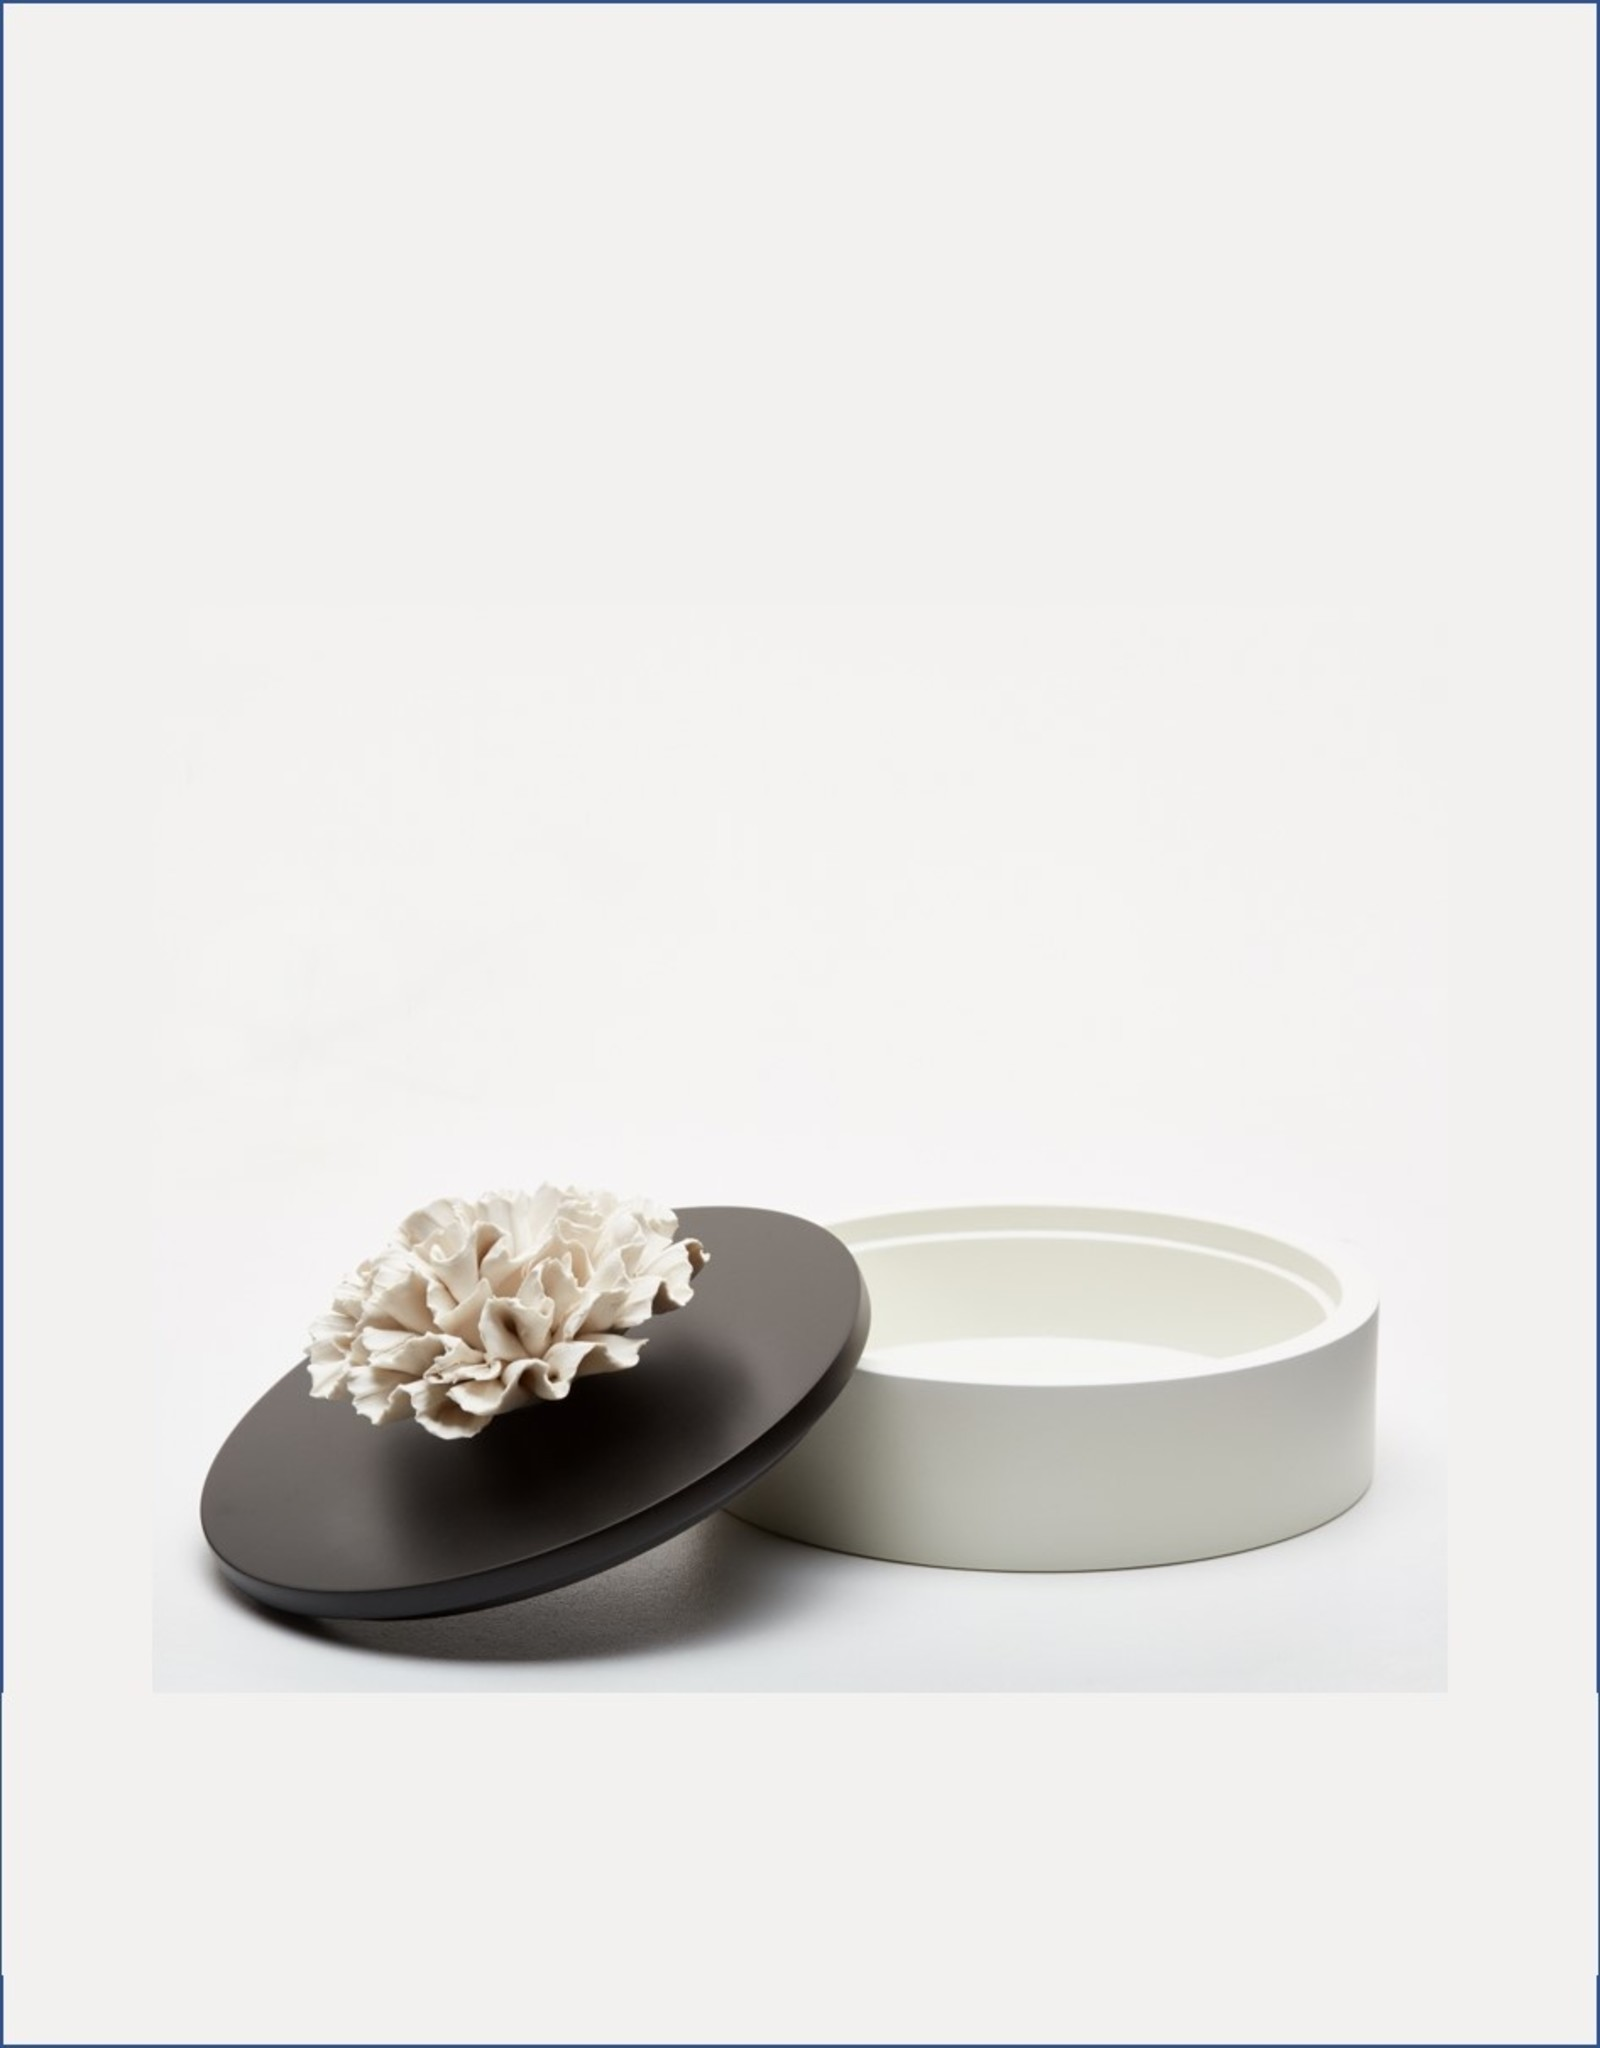 Biscuit porcelain carnation flower treasure box black & white  (Ø 15 cm)